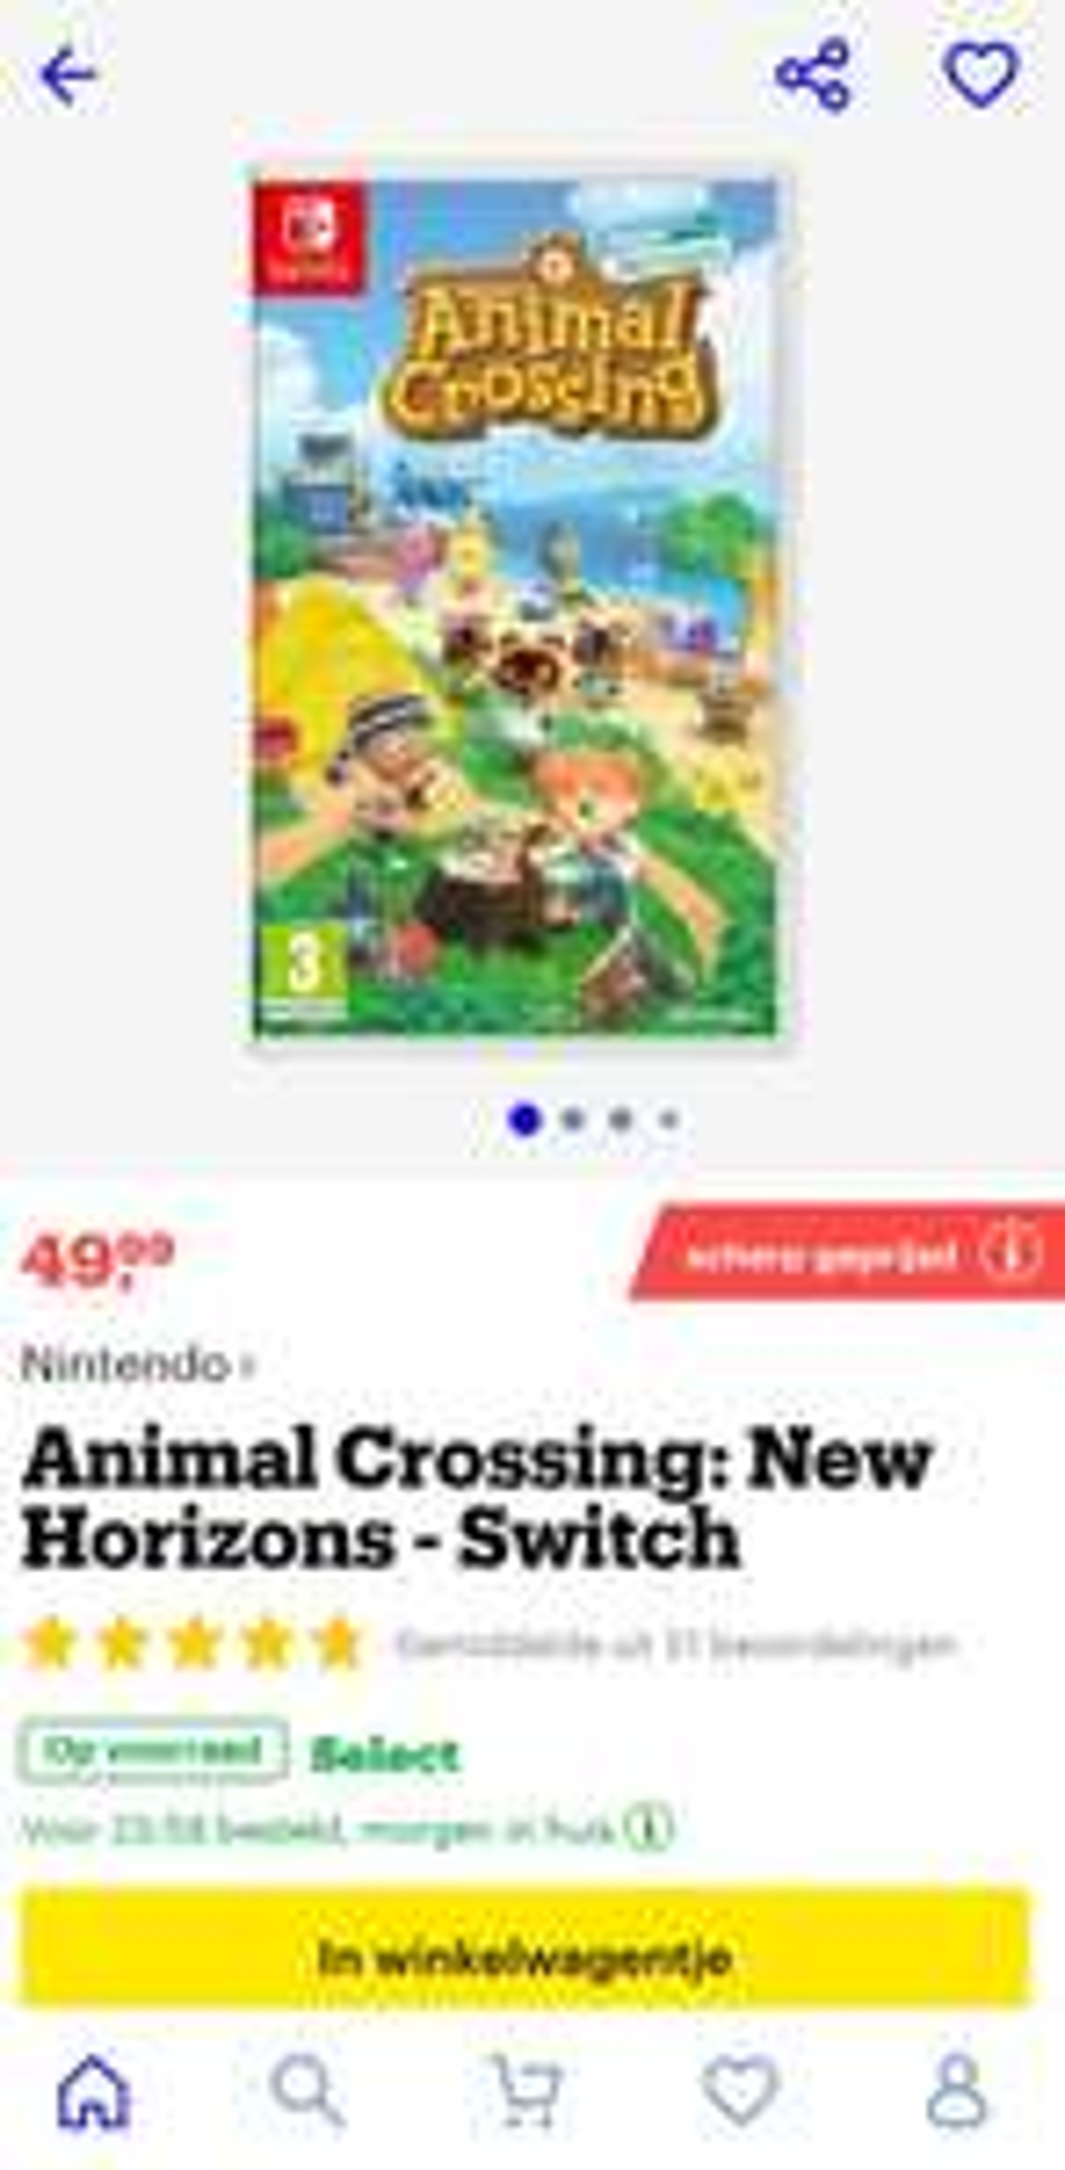 Animal crossing new horizons (NL)